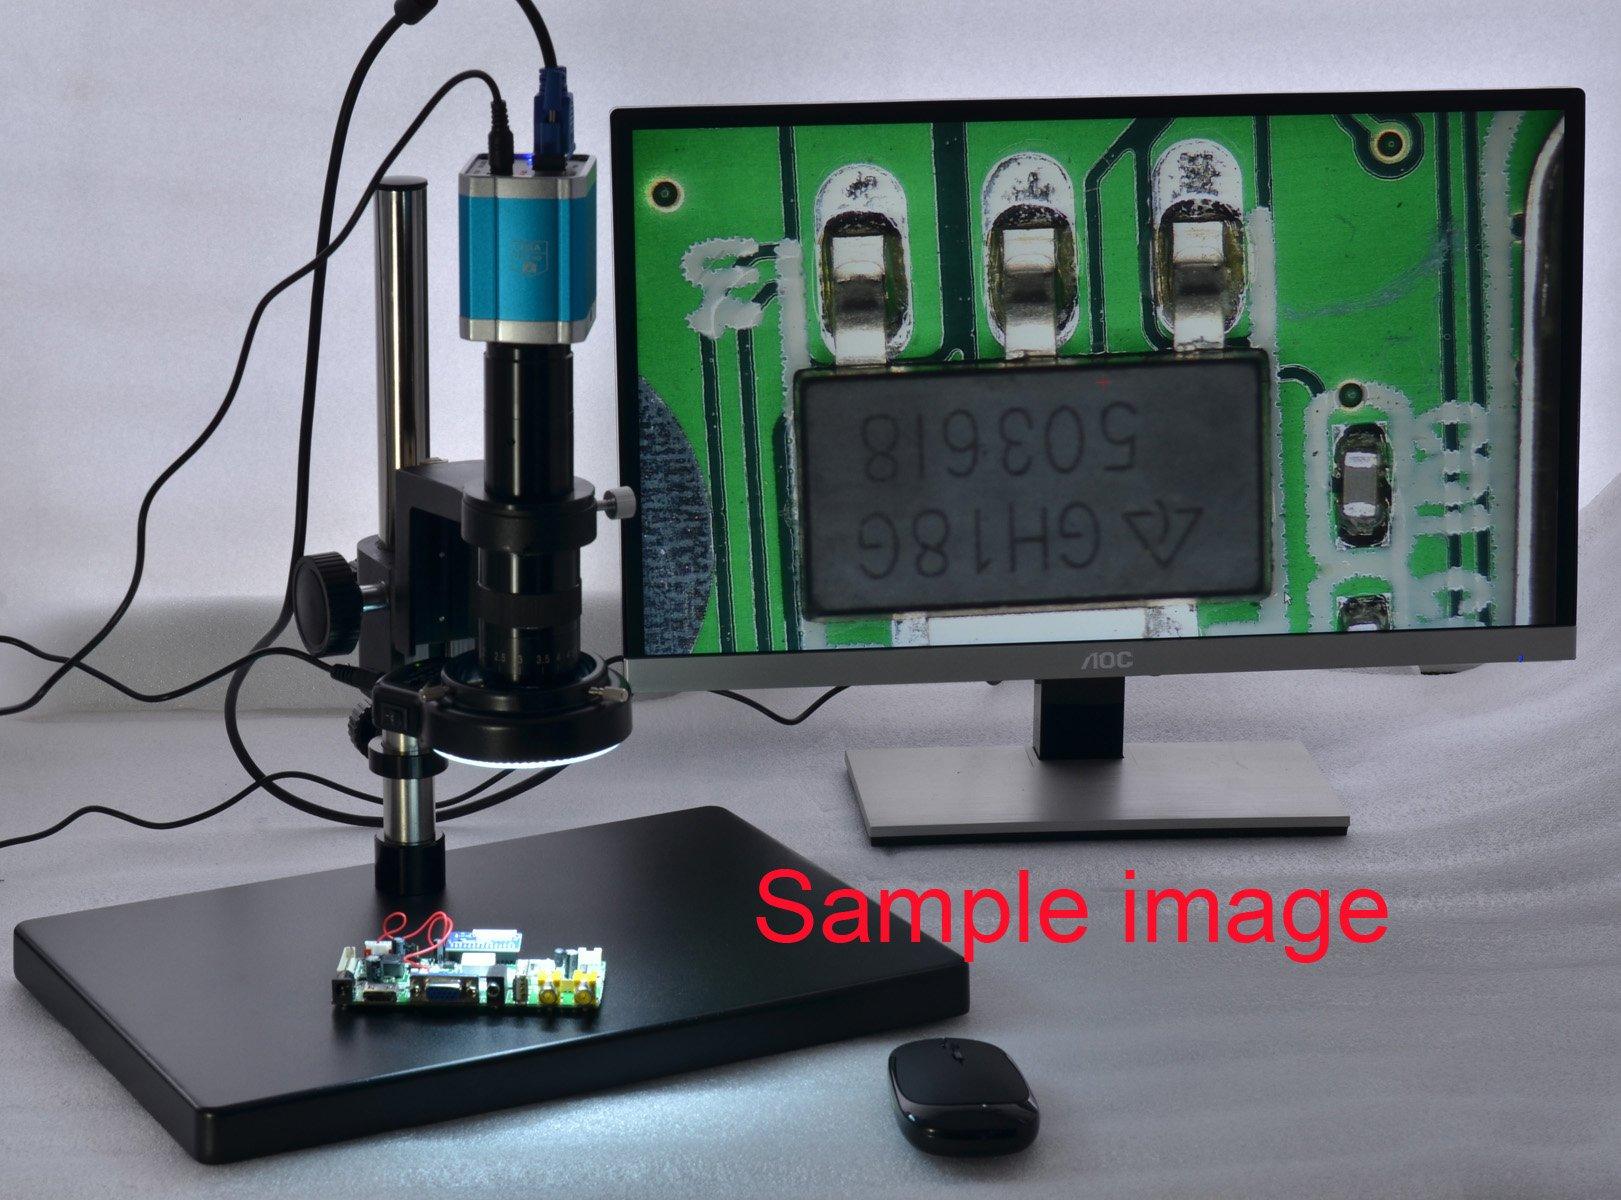 Black 144 LED Bulb Microscope Ring Light Illuminator Adjustable Bright Lamp + Adapter by Aihome (Image #7)